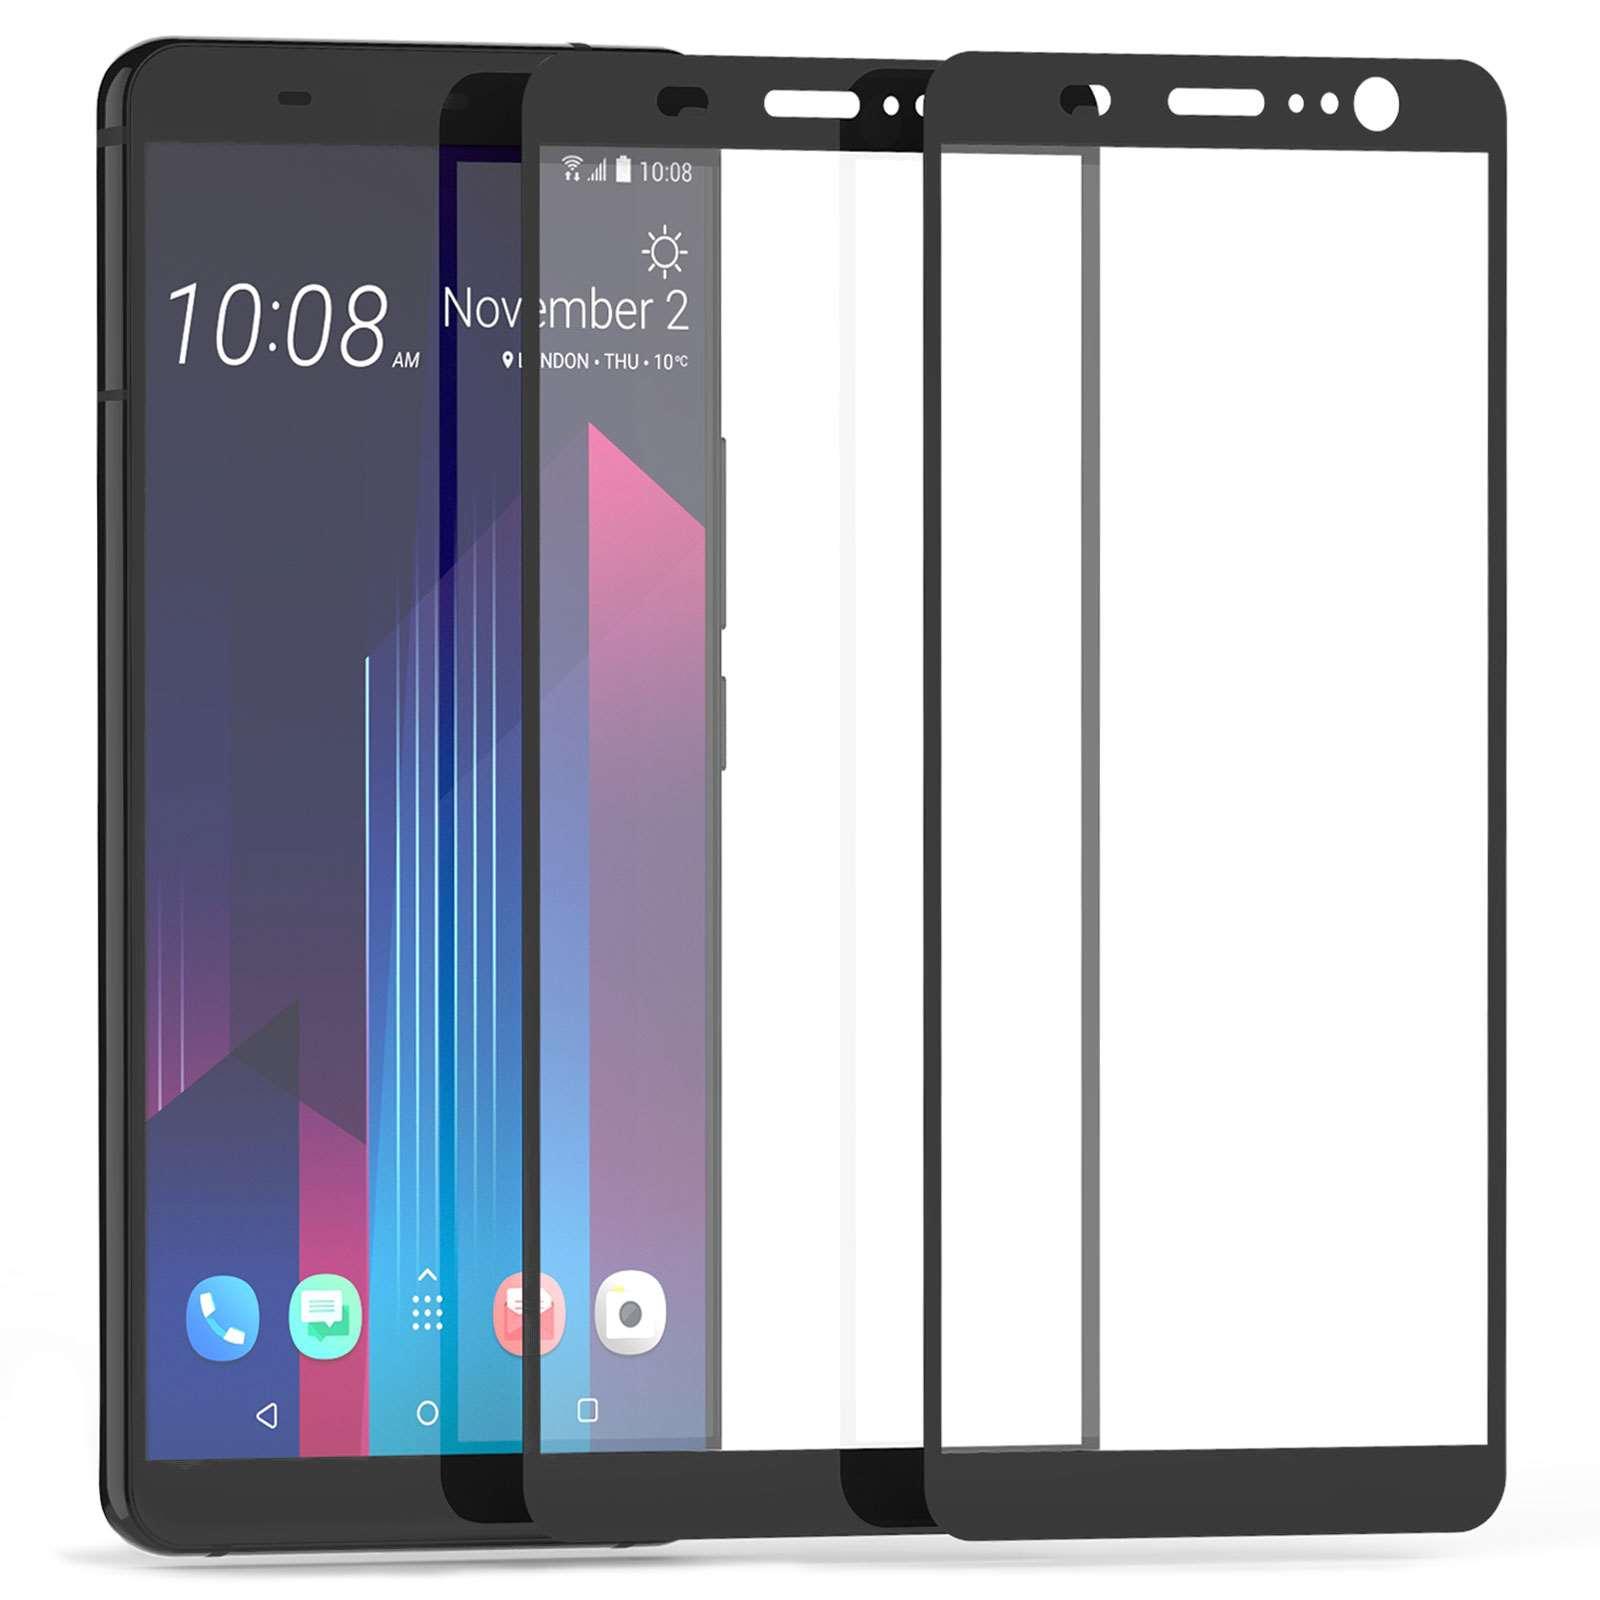 Caseflex Tempered Glass - Αντιχαρακτικό with Black Edge Γυαλί Οθόνης HTC U11 Plus - 2 τεμάχια (HT-DA06-Z123)